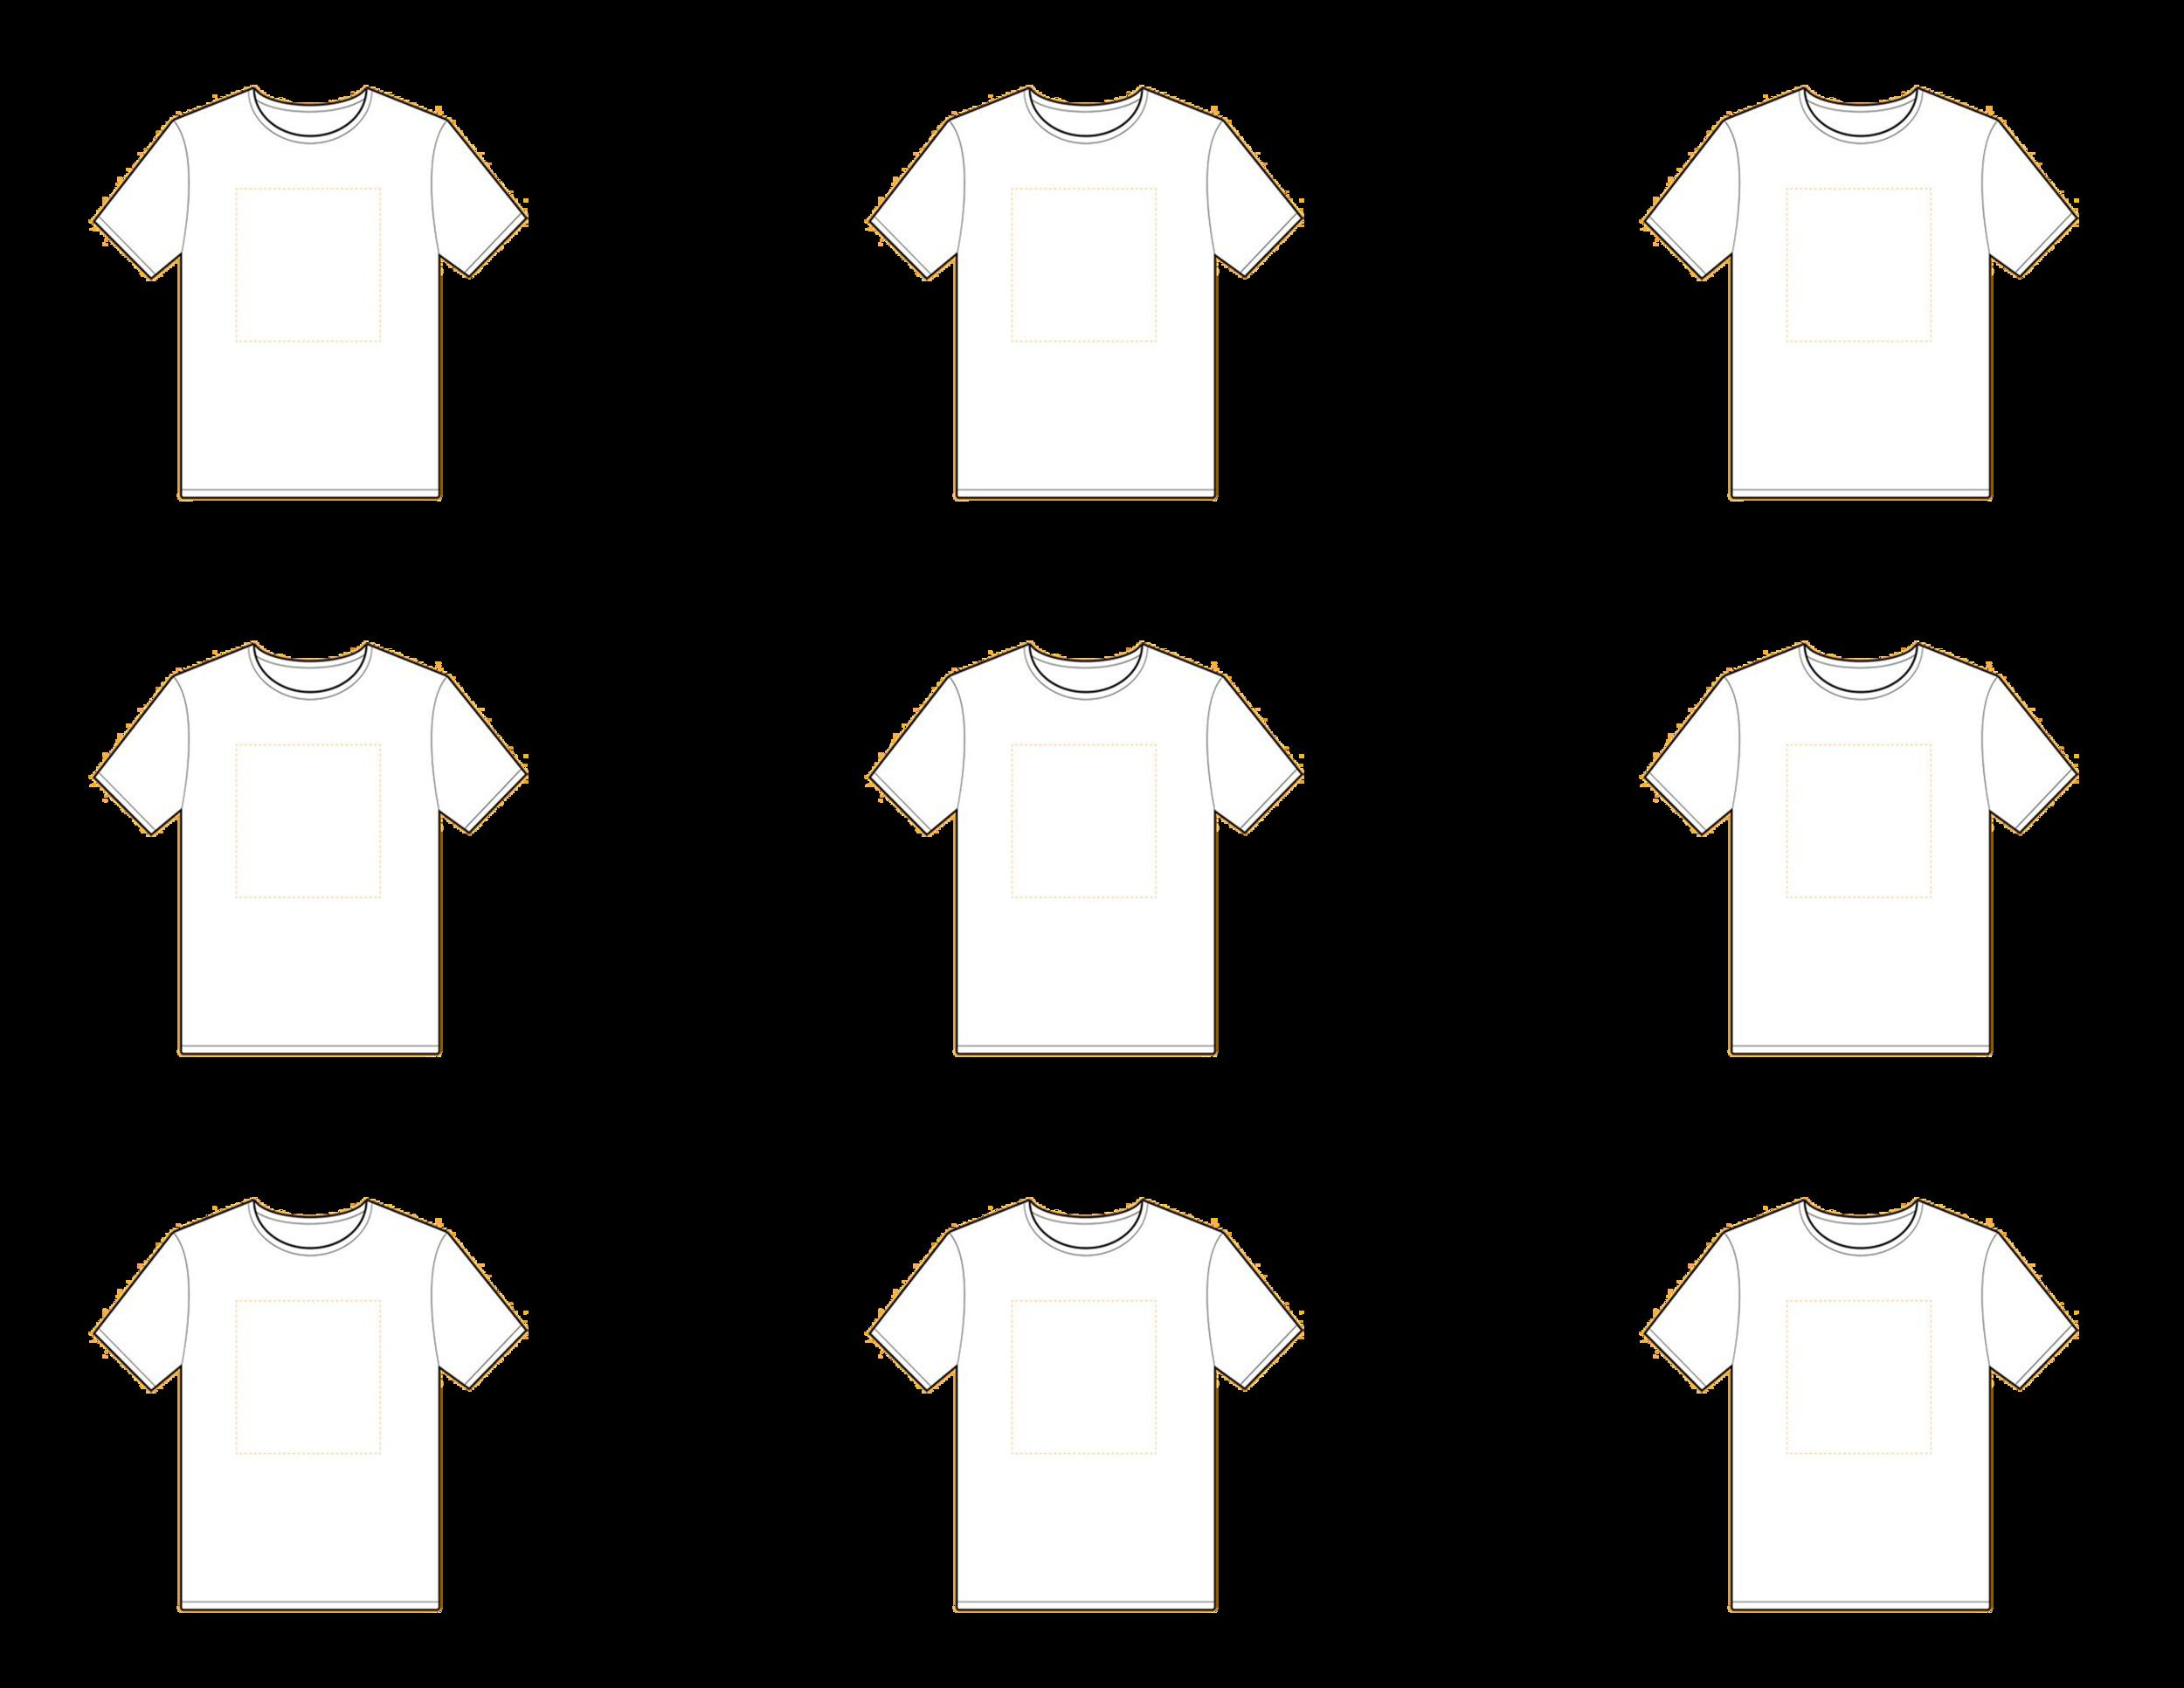 Shirt02.png